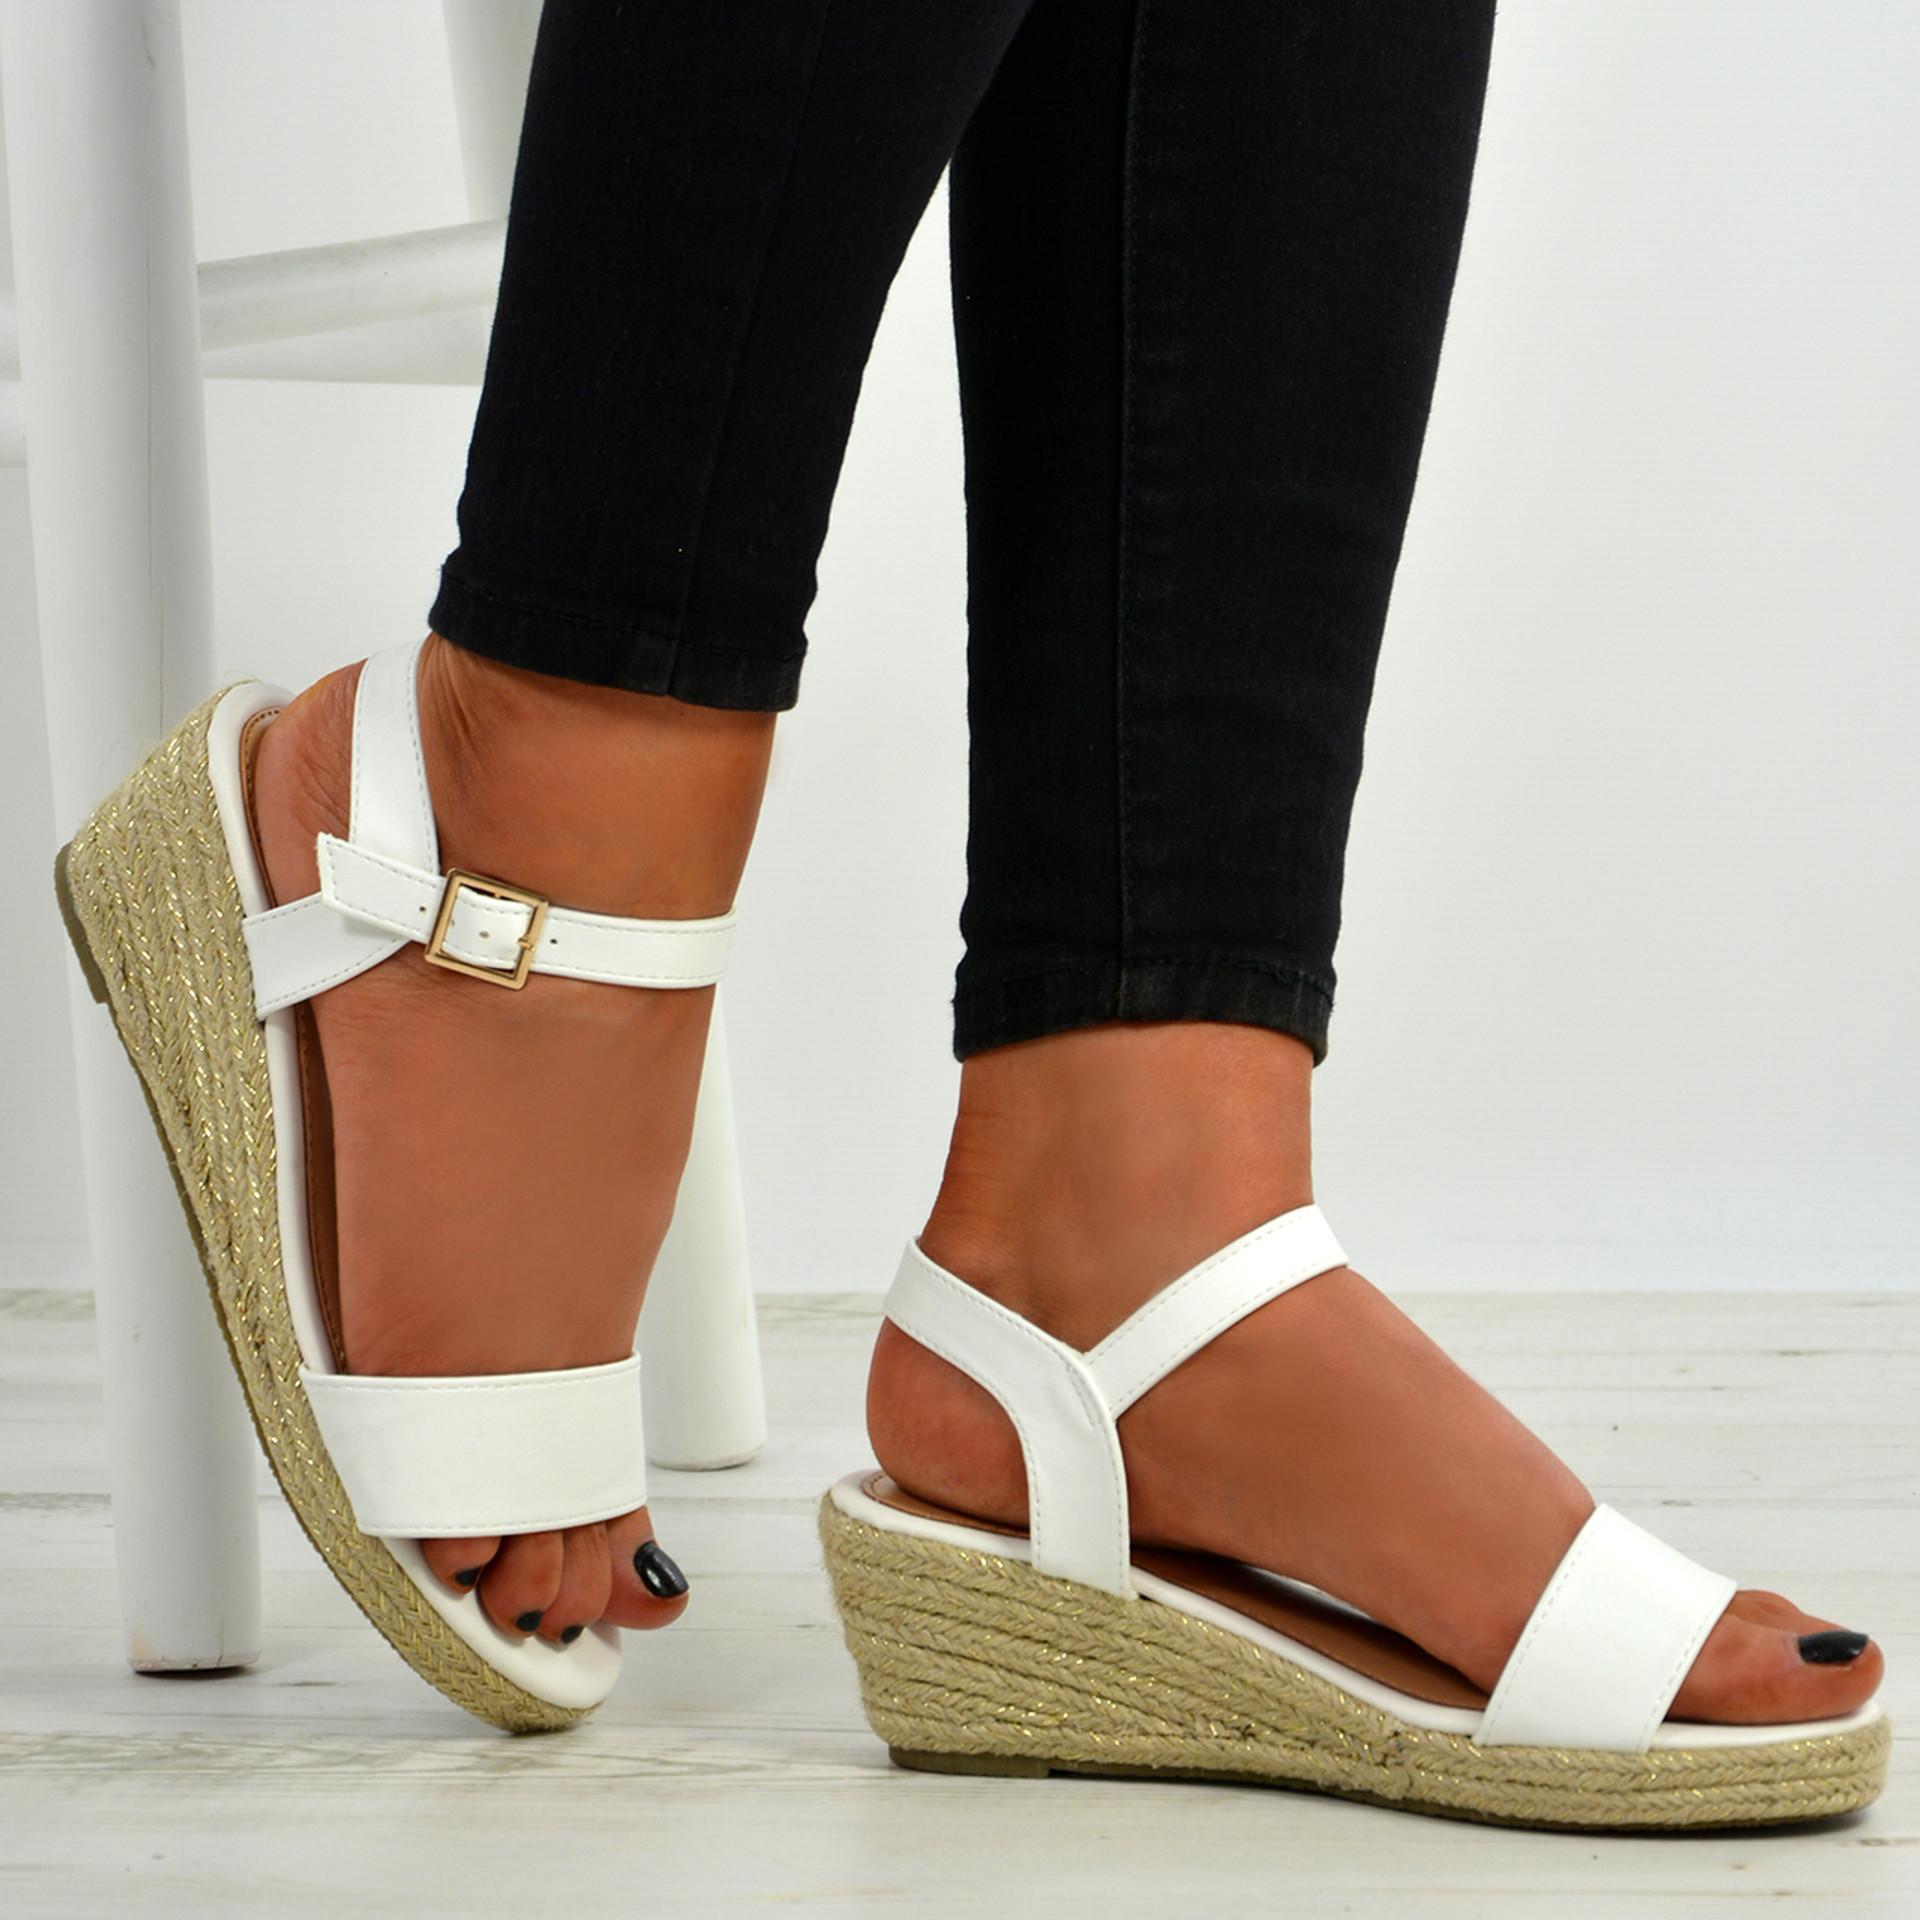 Brisa White Espadrille Wedge Sandals